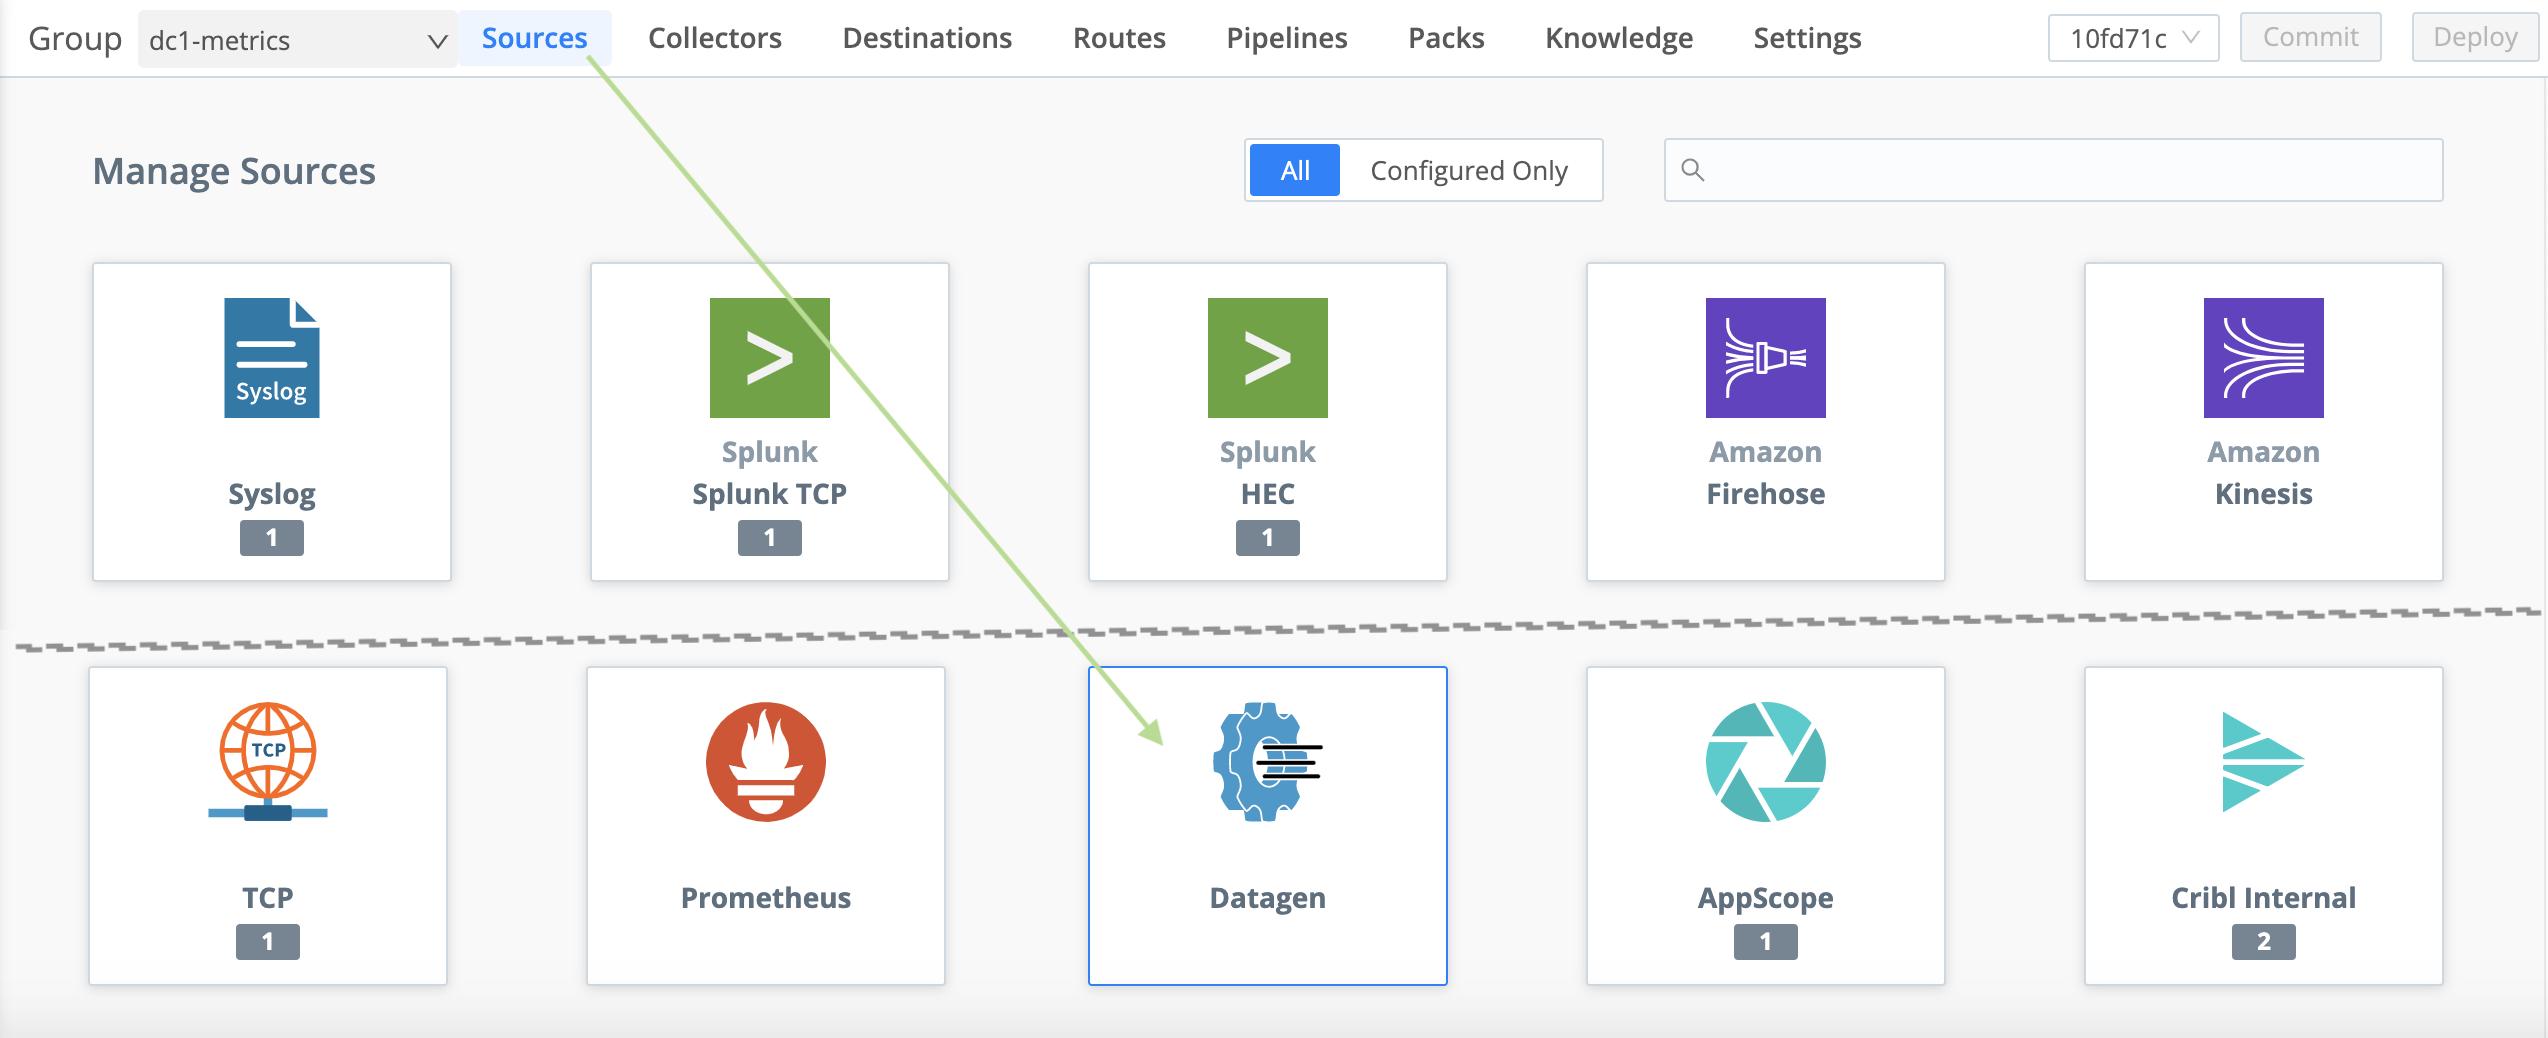 Adding a datagen Source